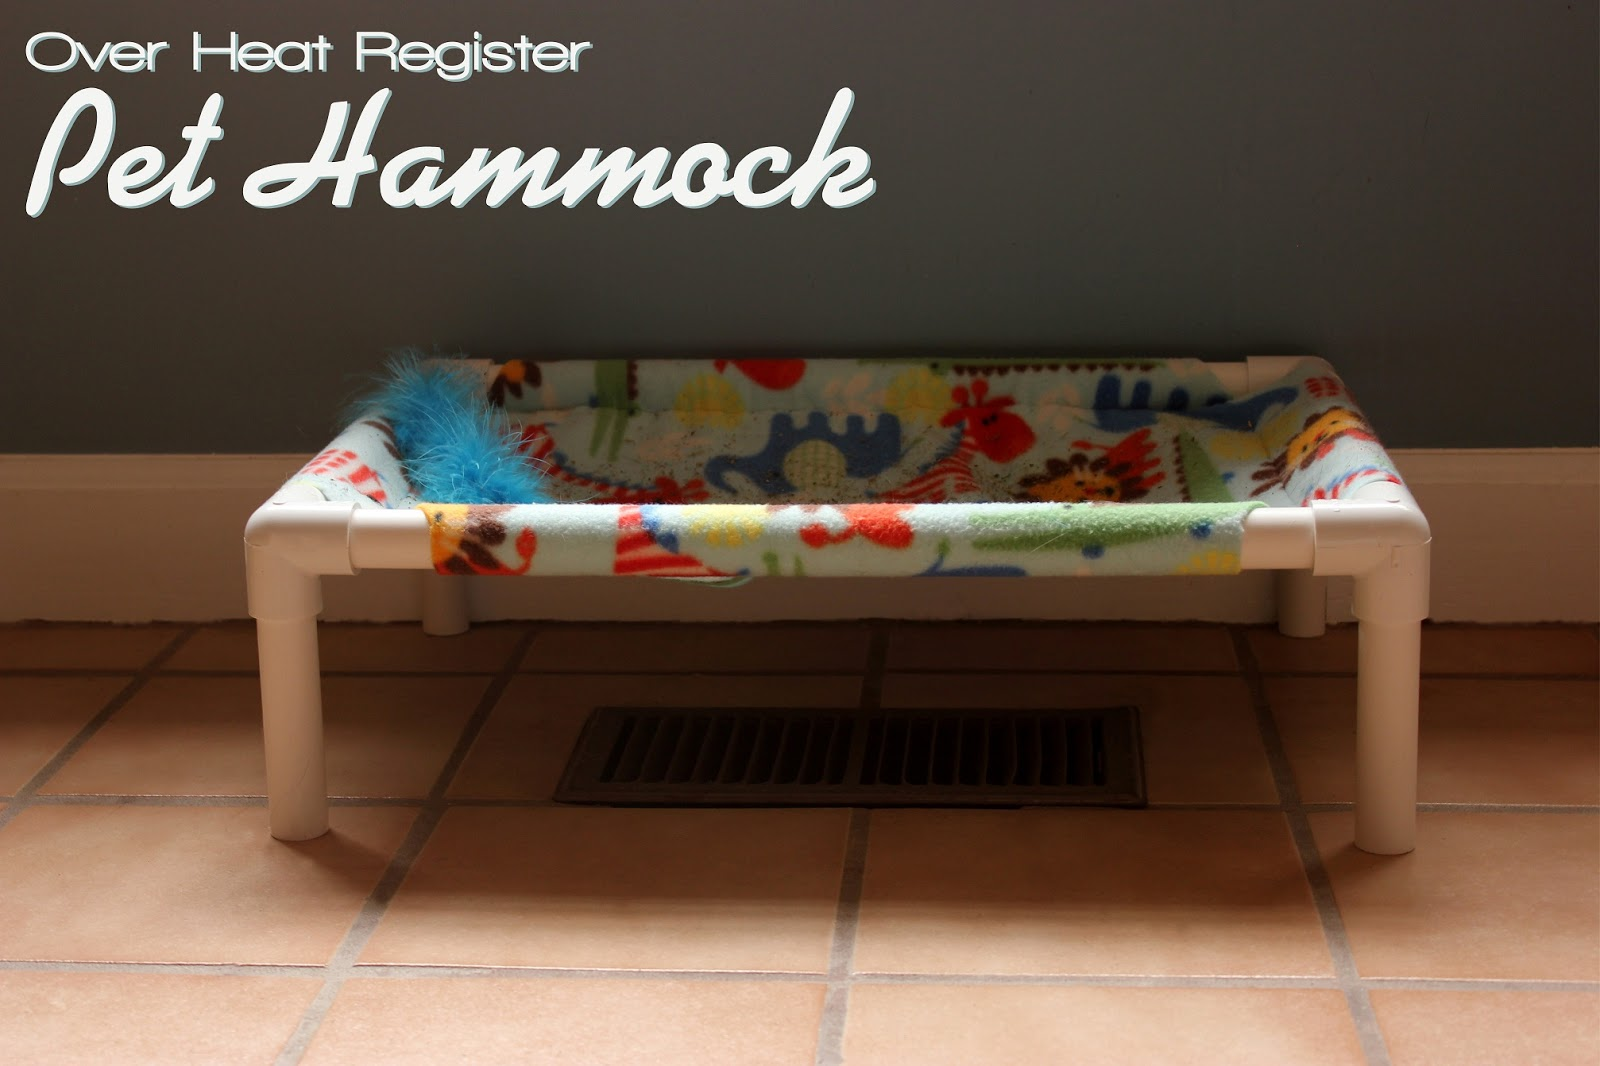 ac main reversible chewy hammock com parade pet dp video